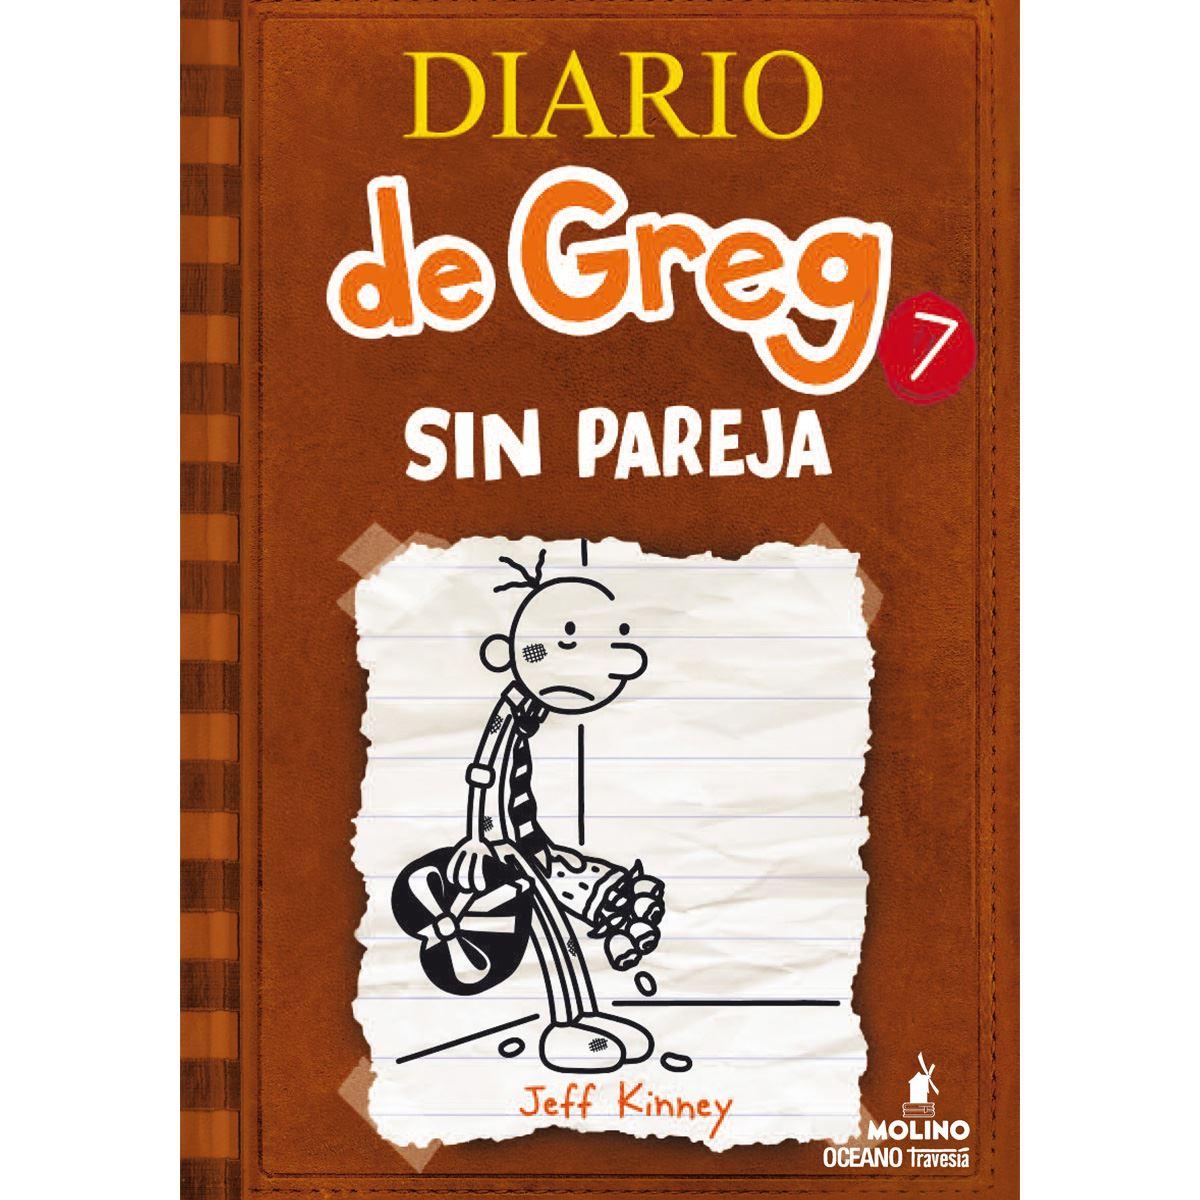 Diario de Greg 7. Sin pareja Rústica